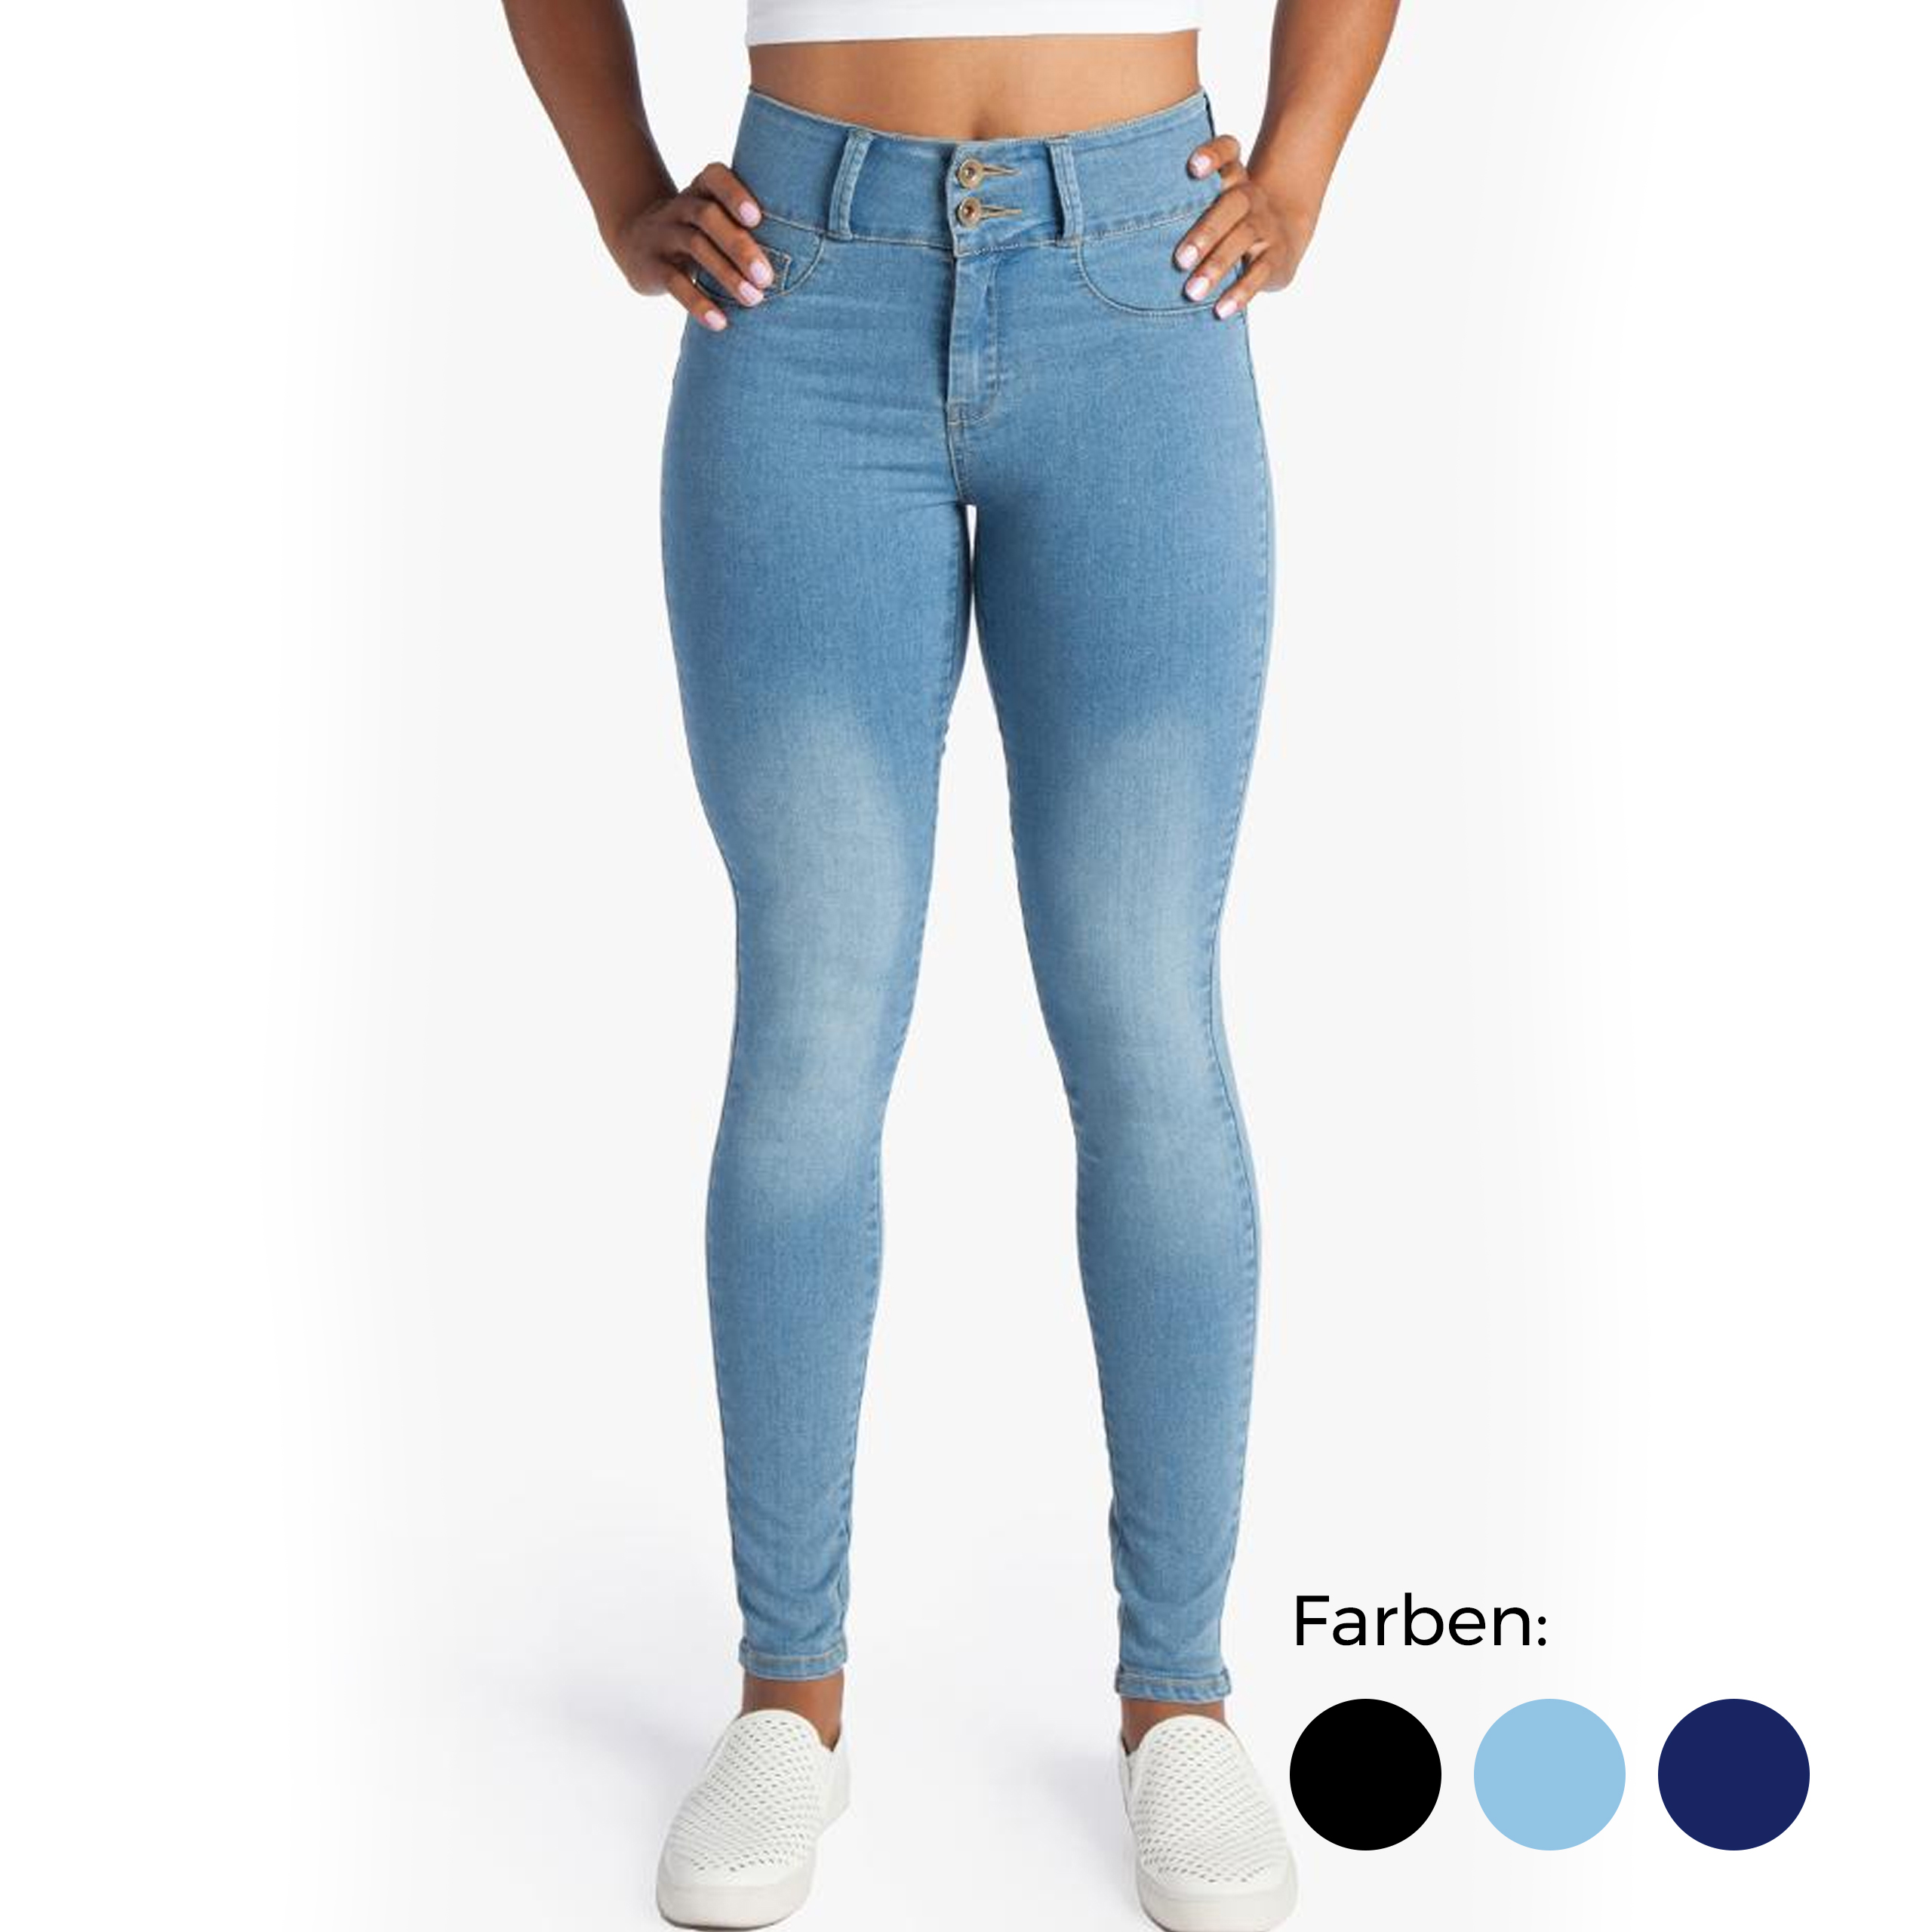 Утягивающие джинсы MyFit в Южно-Сахалинске